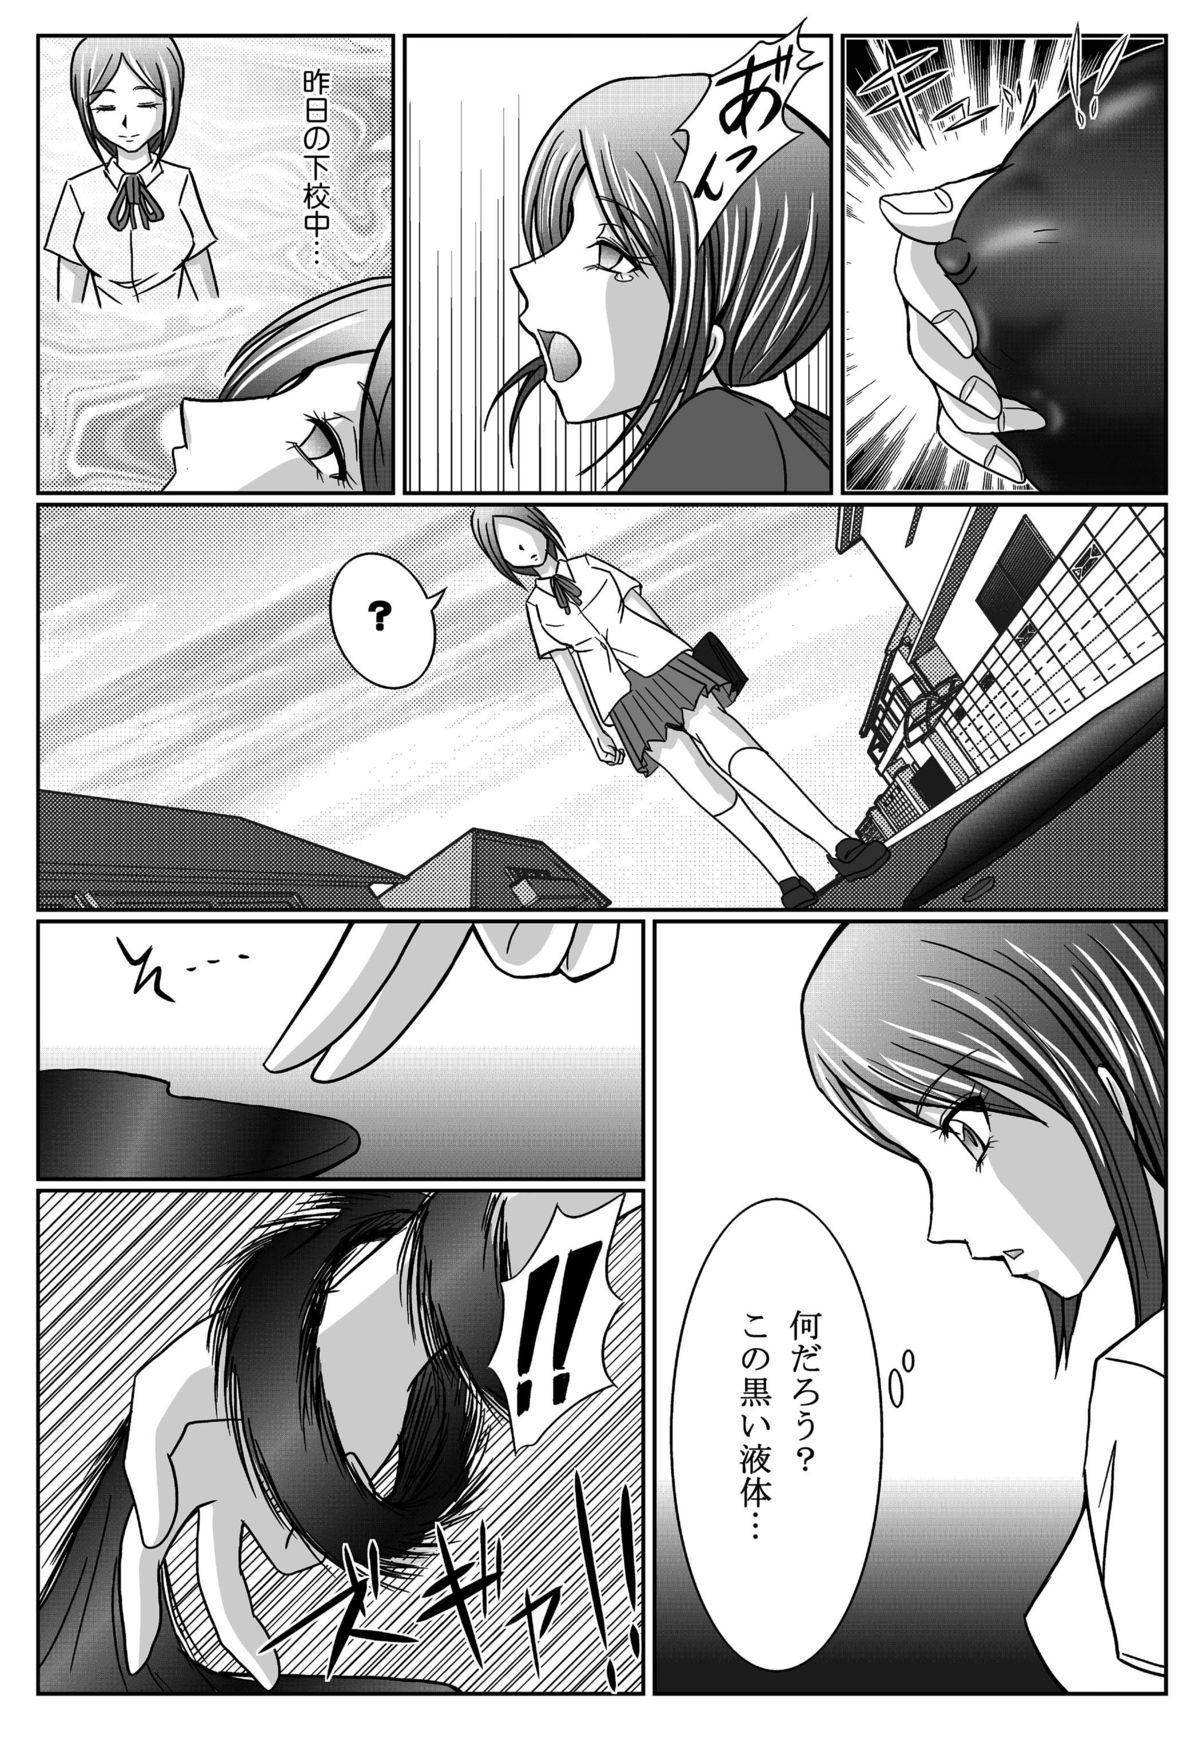 [Macxe's (monmon)] Tokubousentai Dinaranger ~Heroine Kairaku Sennou Keikaku~ Vol.01/02/03 (Renkaban) [Digital] 93